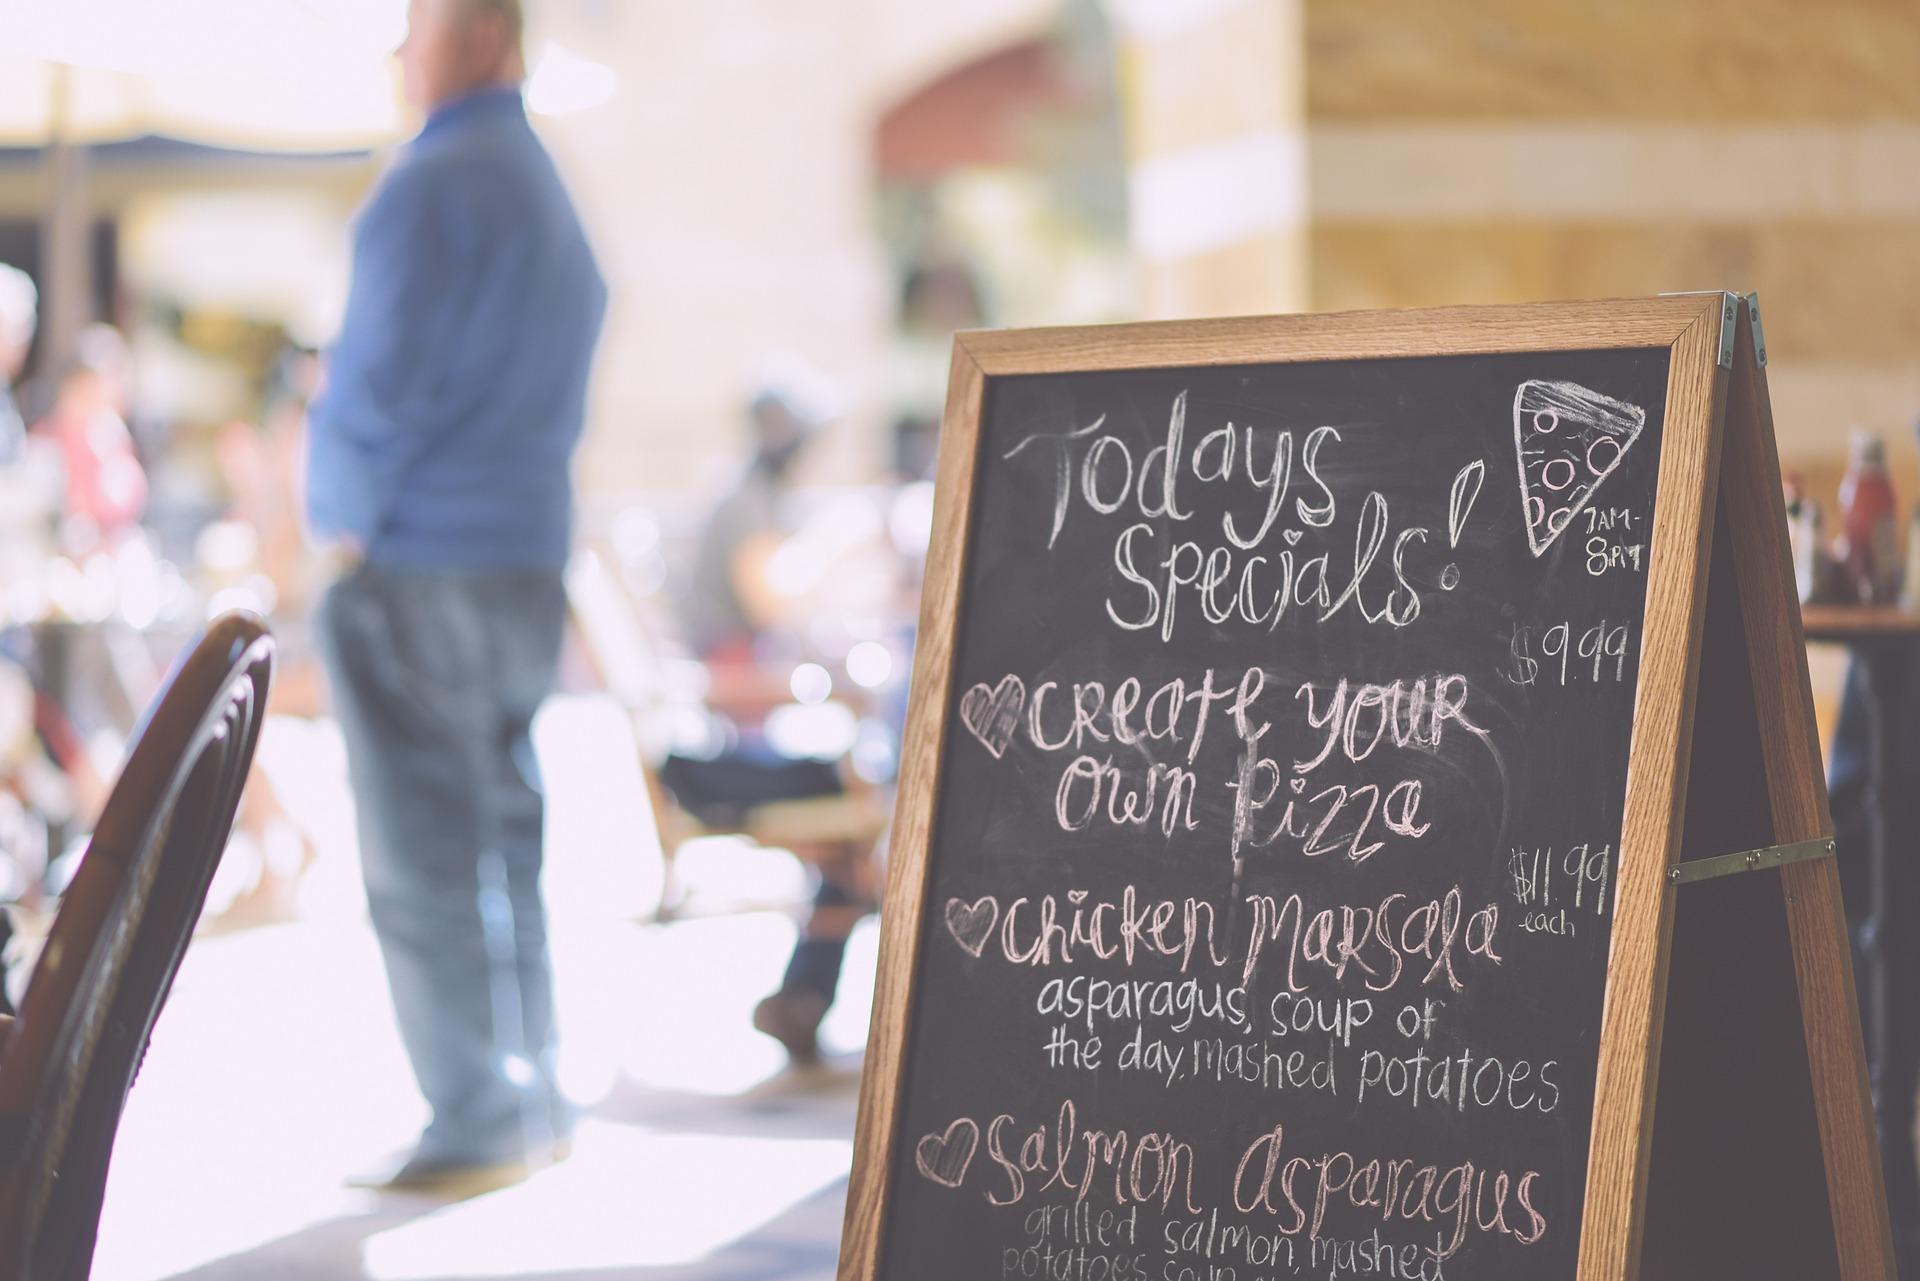 Kundenstopper Cafe Gehwegaufsteller Werbung